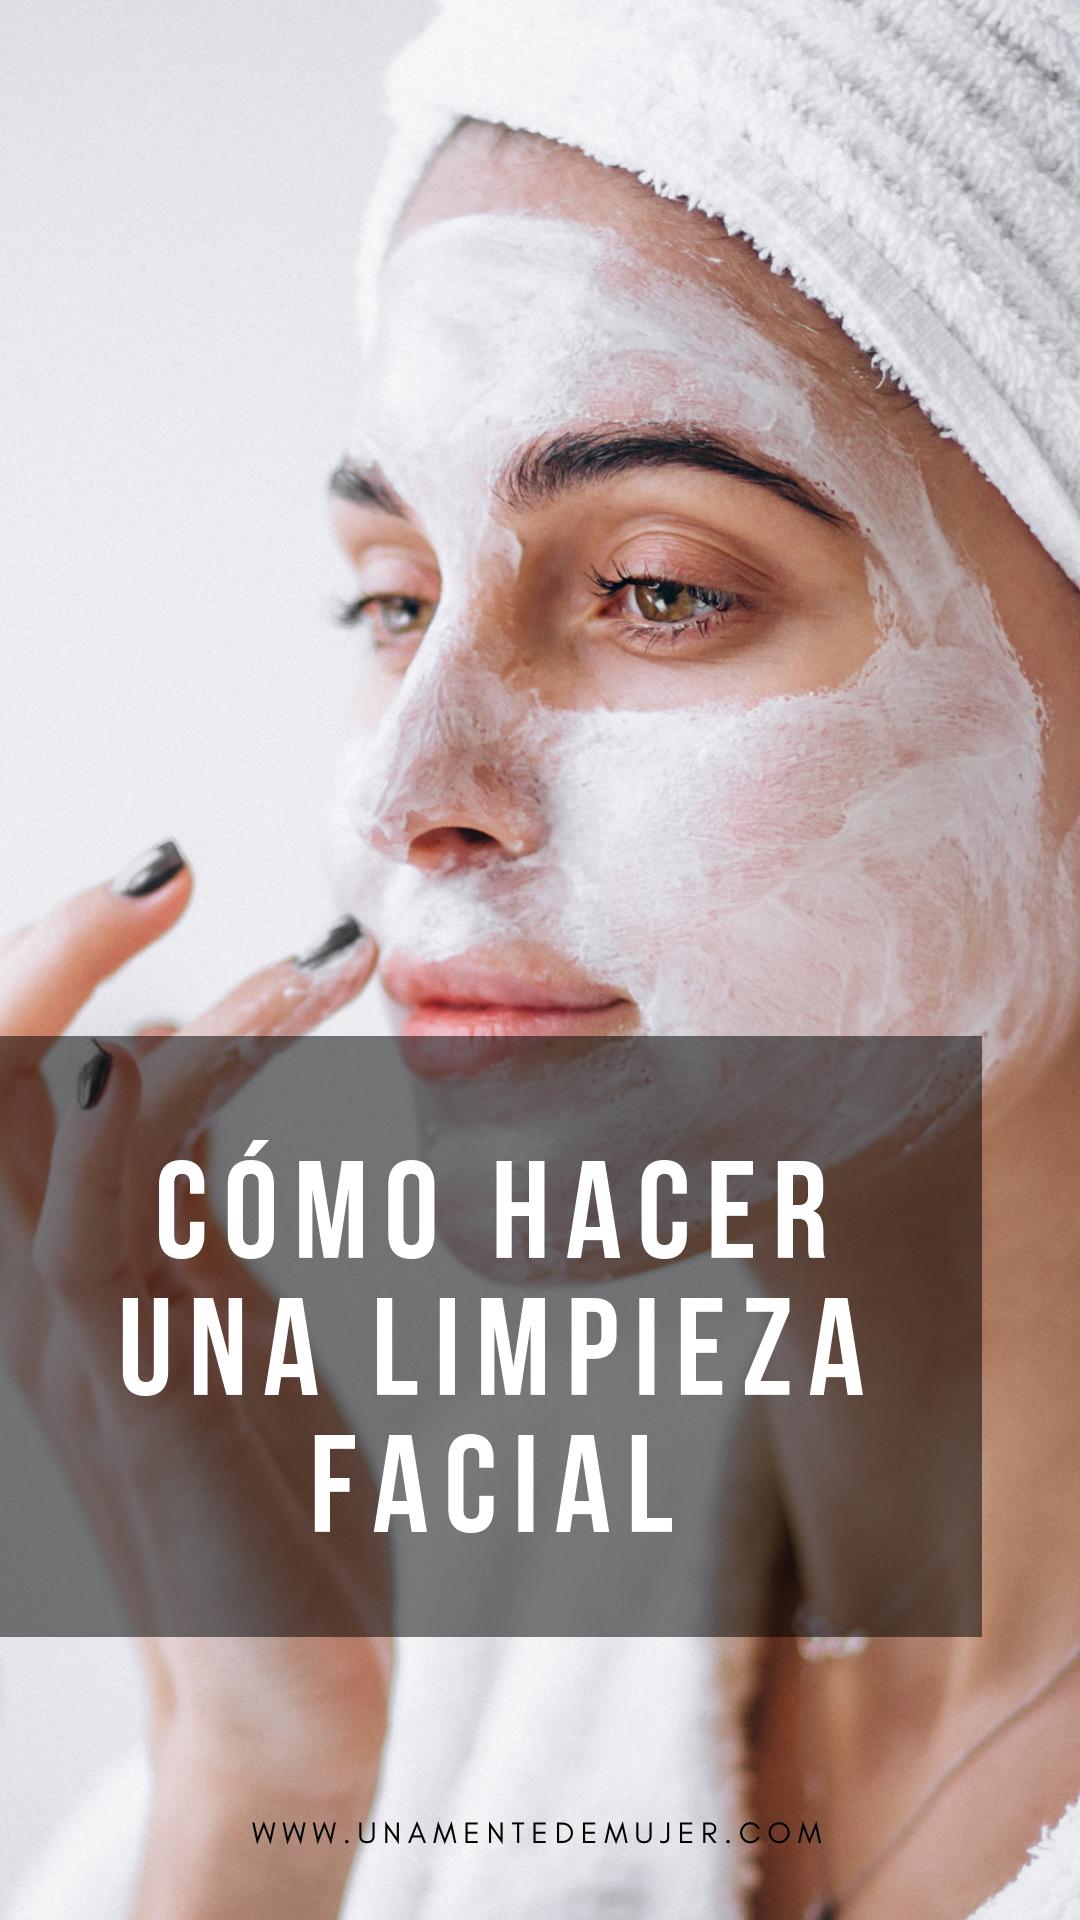 como hacer limpieza facial paso a paso